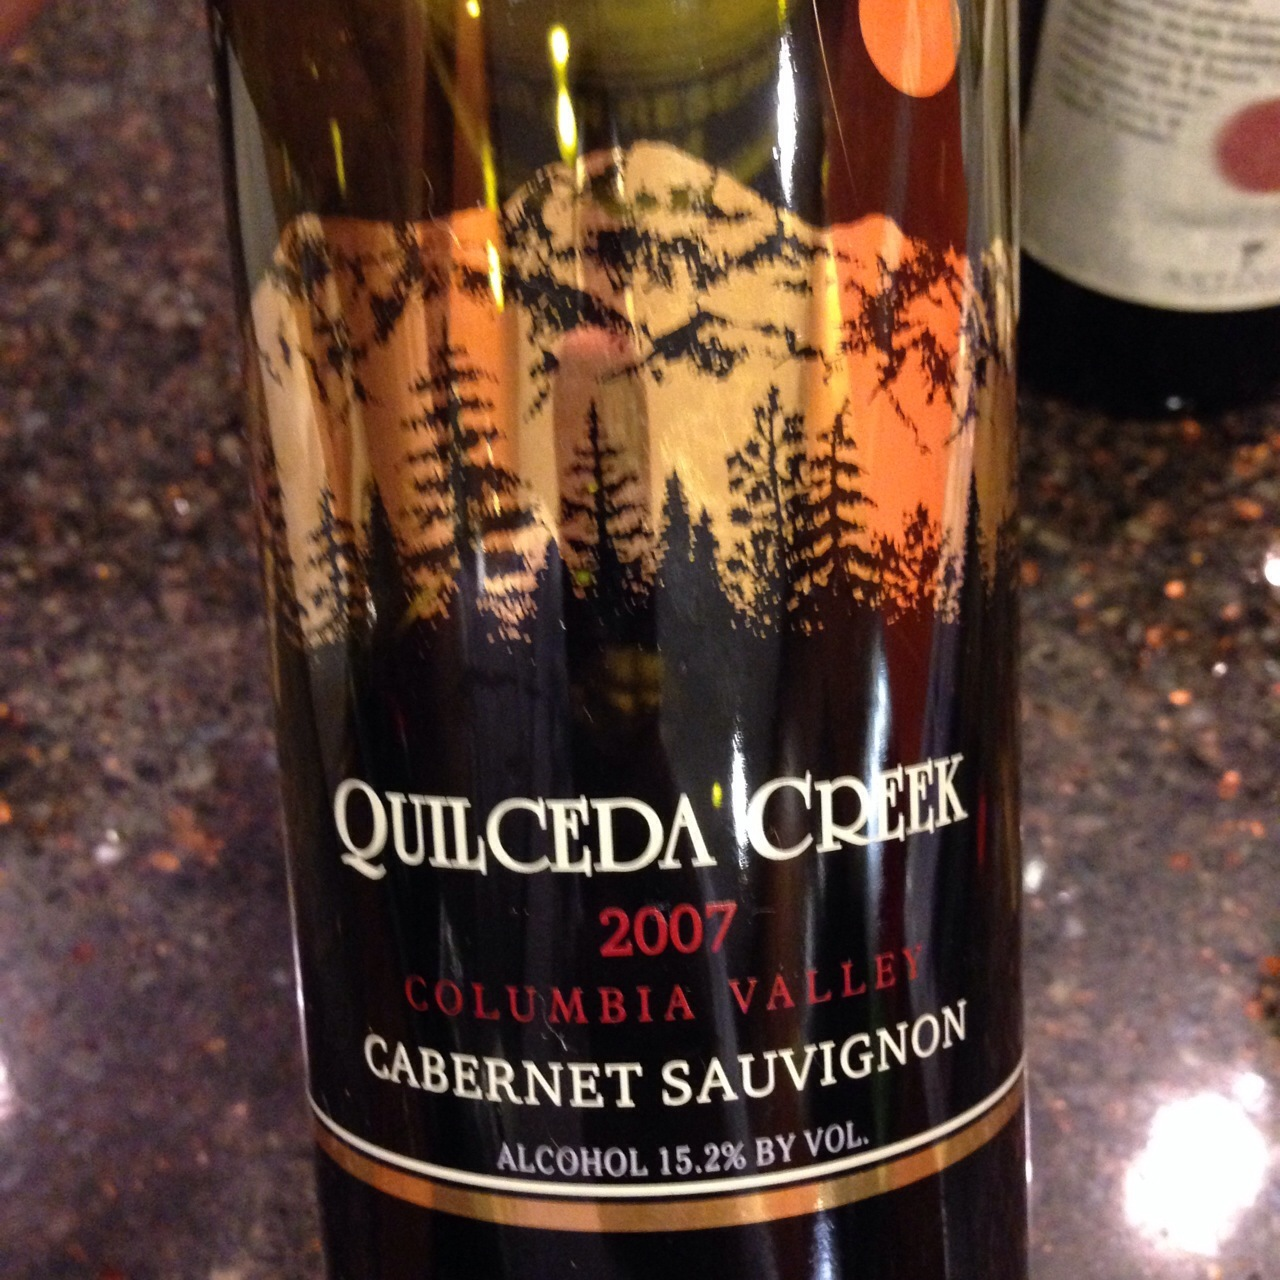 Quilceda Creek Columbia Valley Cabernet Sauvignon 2007 Chambers Street Wines